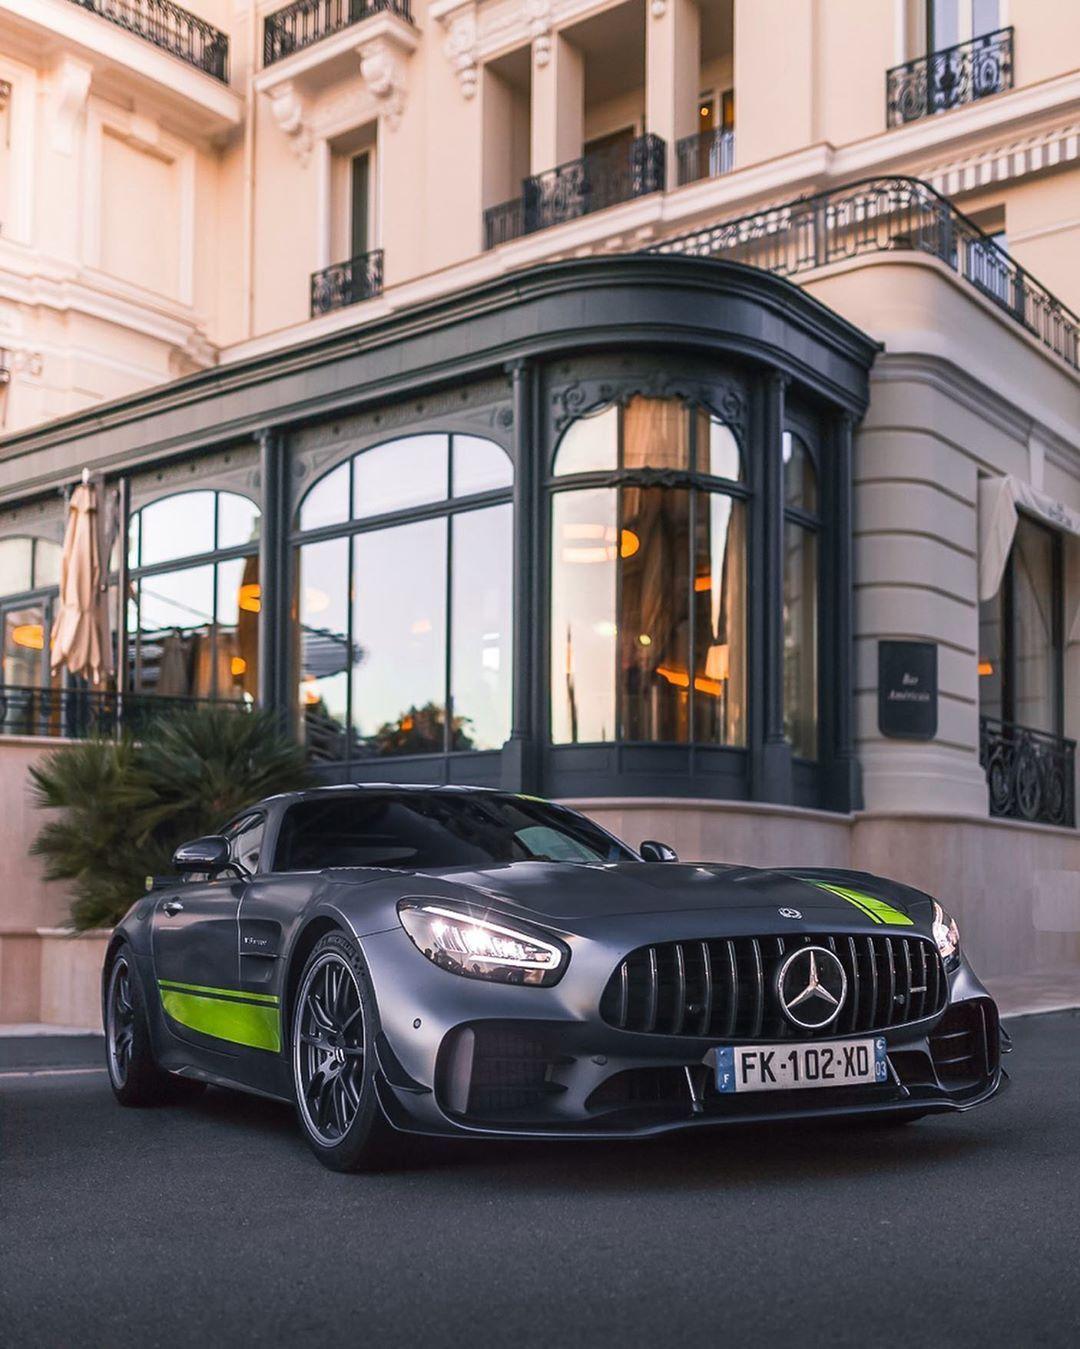 Monaco Monako On Instagram You Ll Need A Firearms License To Drive It Mercedes Amg Gtrpro Gtr Monaco Sports Car